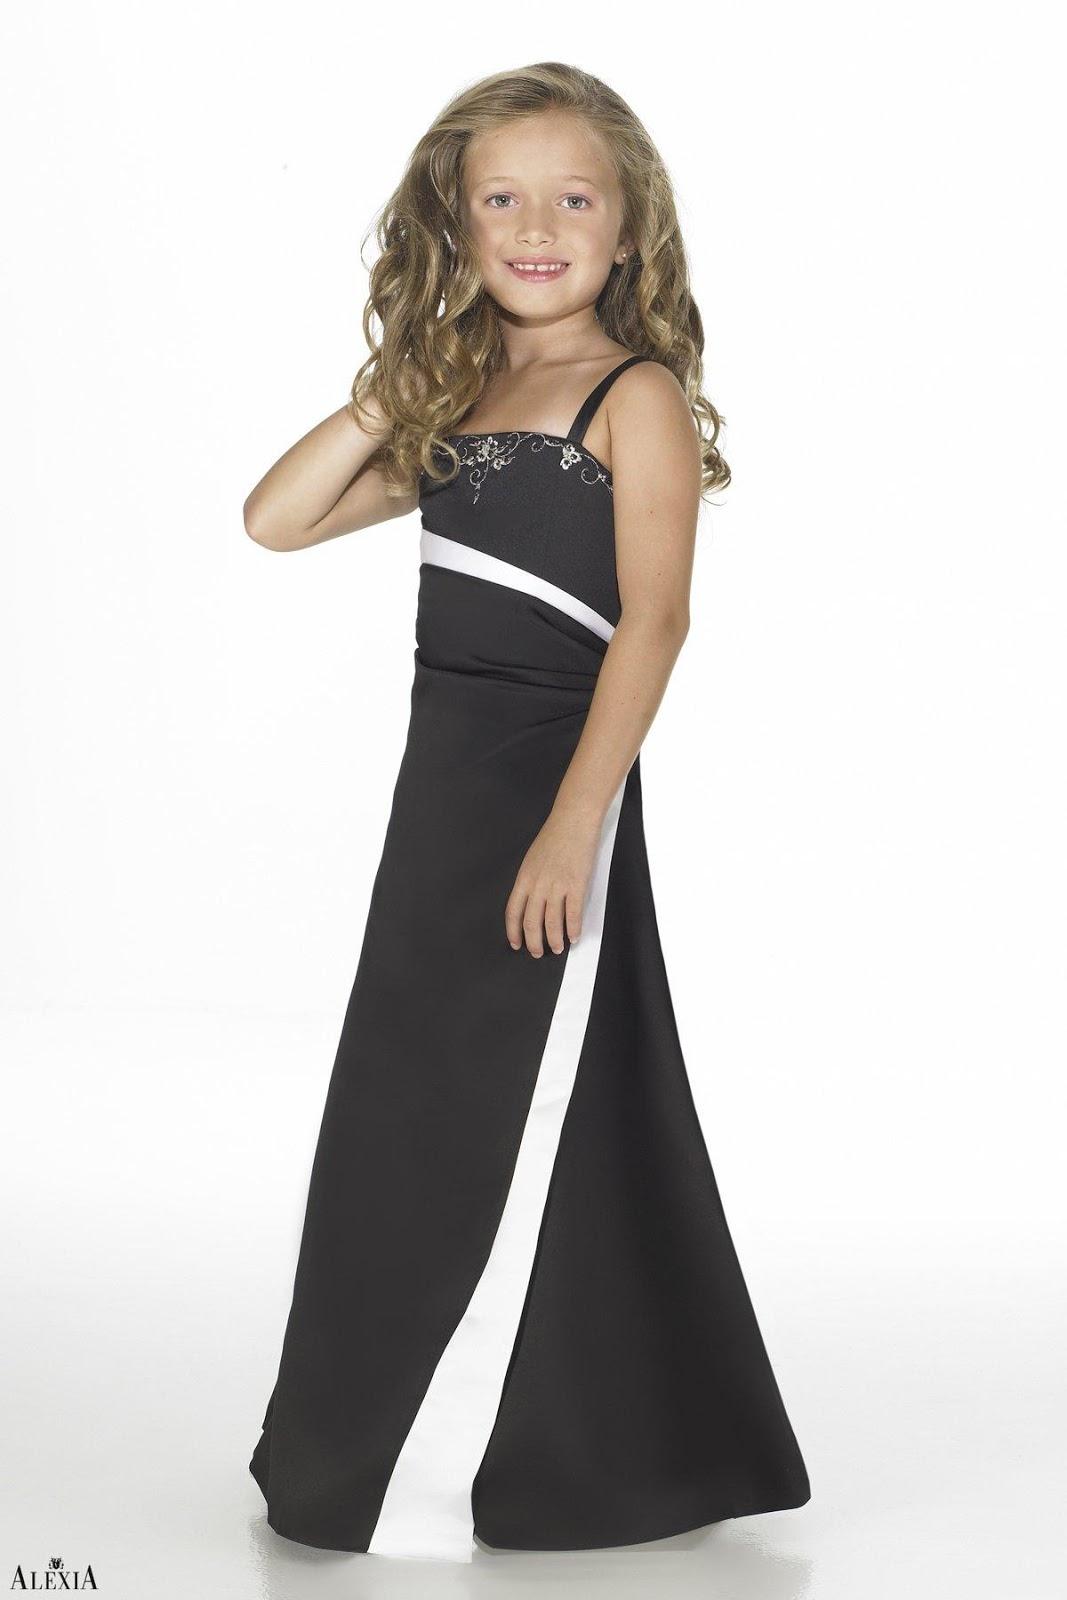 WhiteAzalea Junior Dresses: Black Bridesmaid Dresses for ...